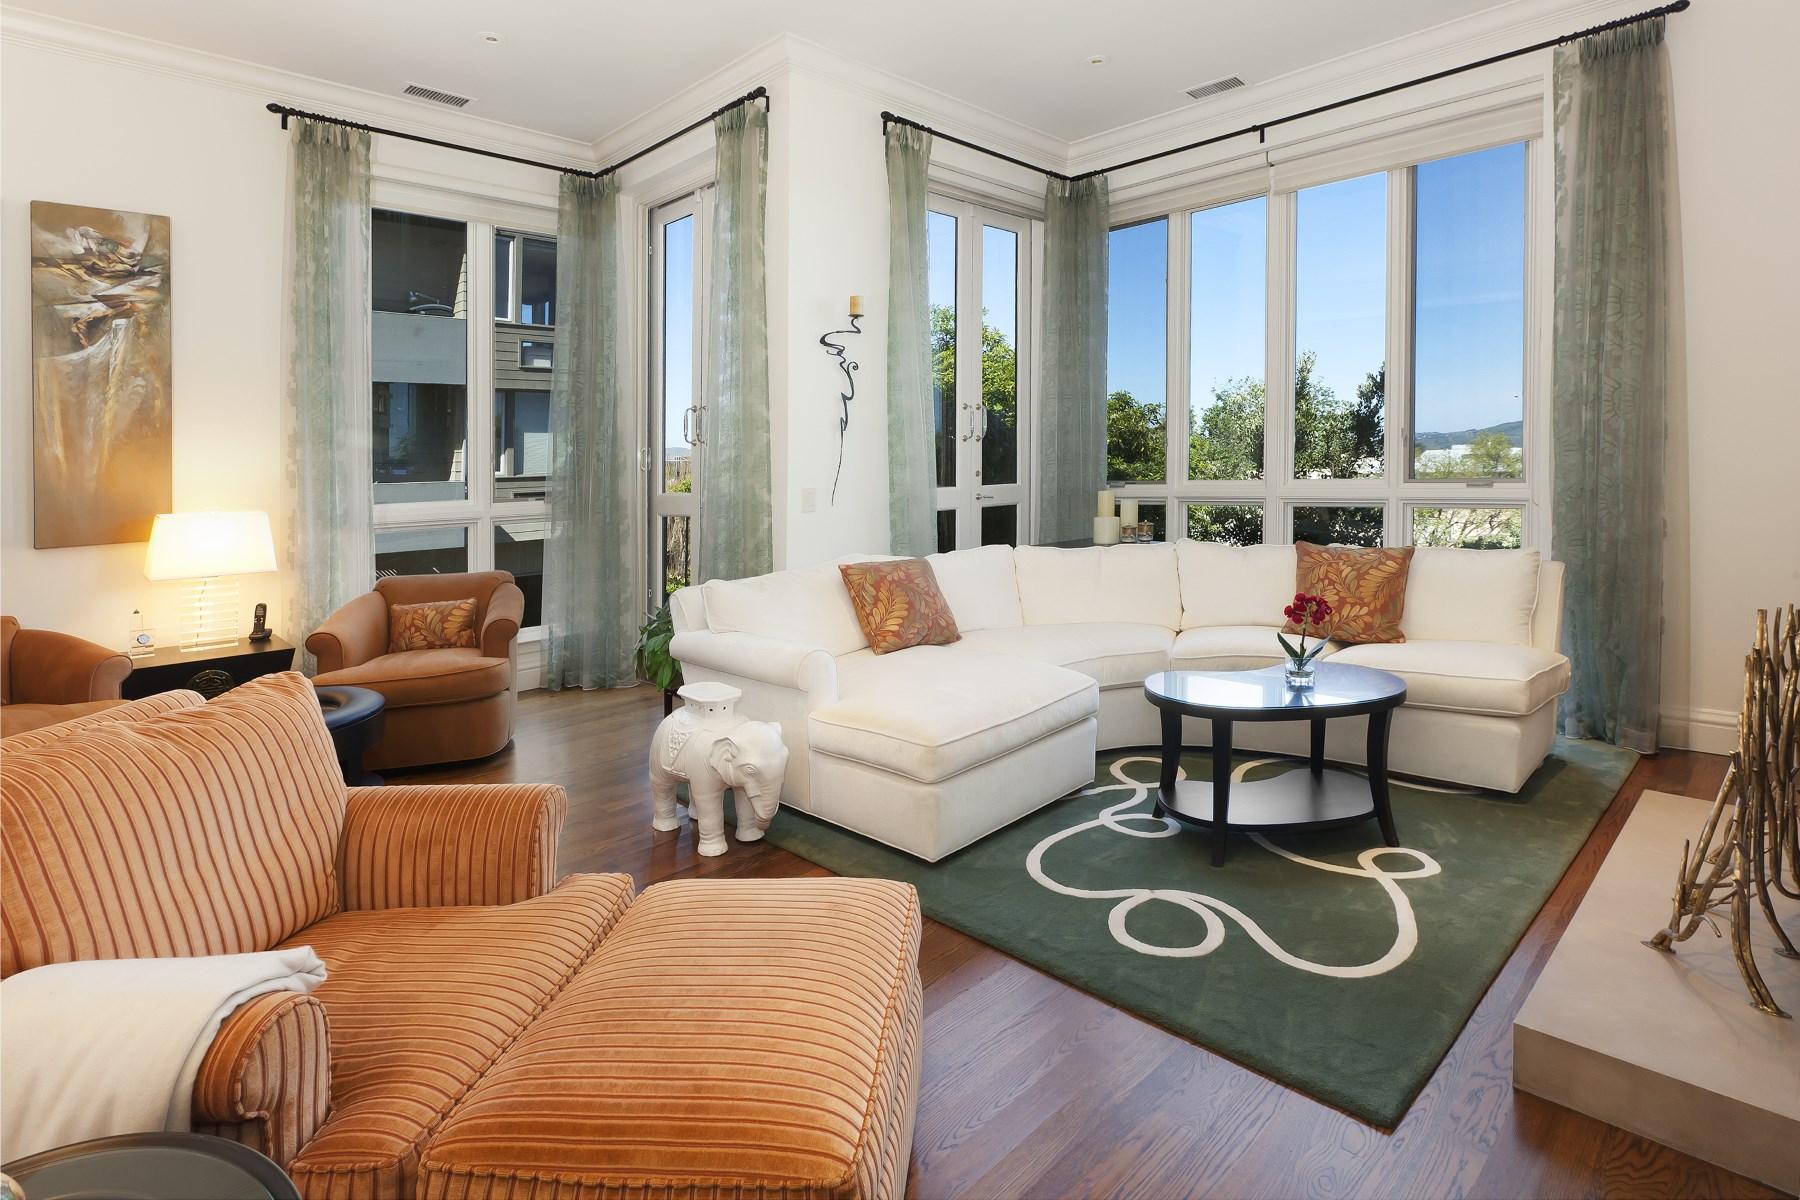 共管物業 為 出售 在 Elegant House-Like Condo with Bay Views 186 Francisco St Apt 1 Telegraph Hill, San Francisco, 加利福尼亞州, 94133 美國